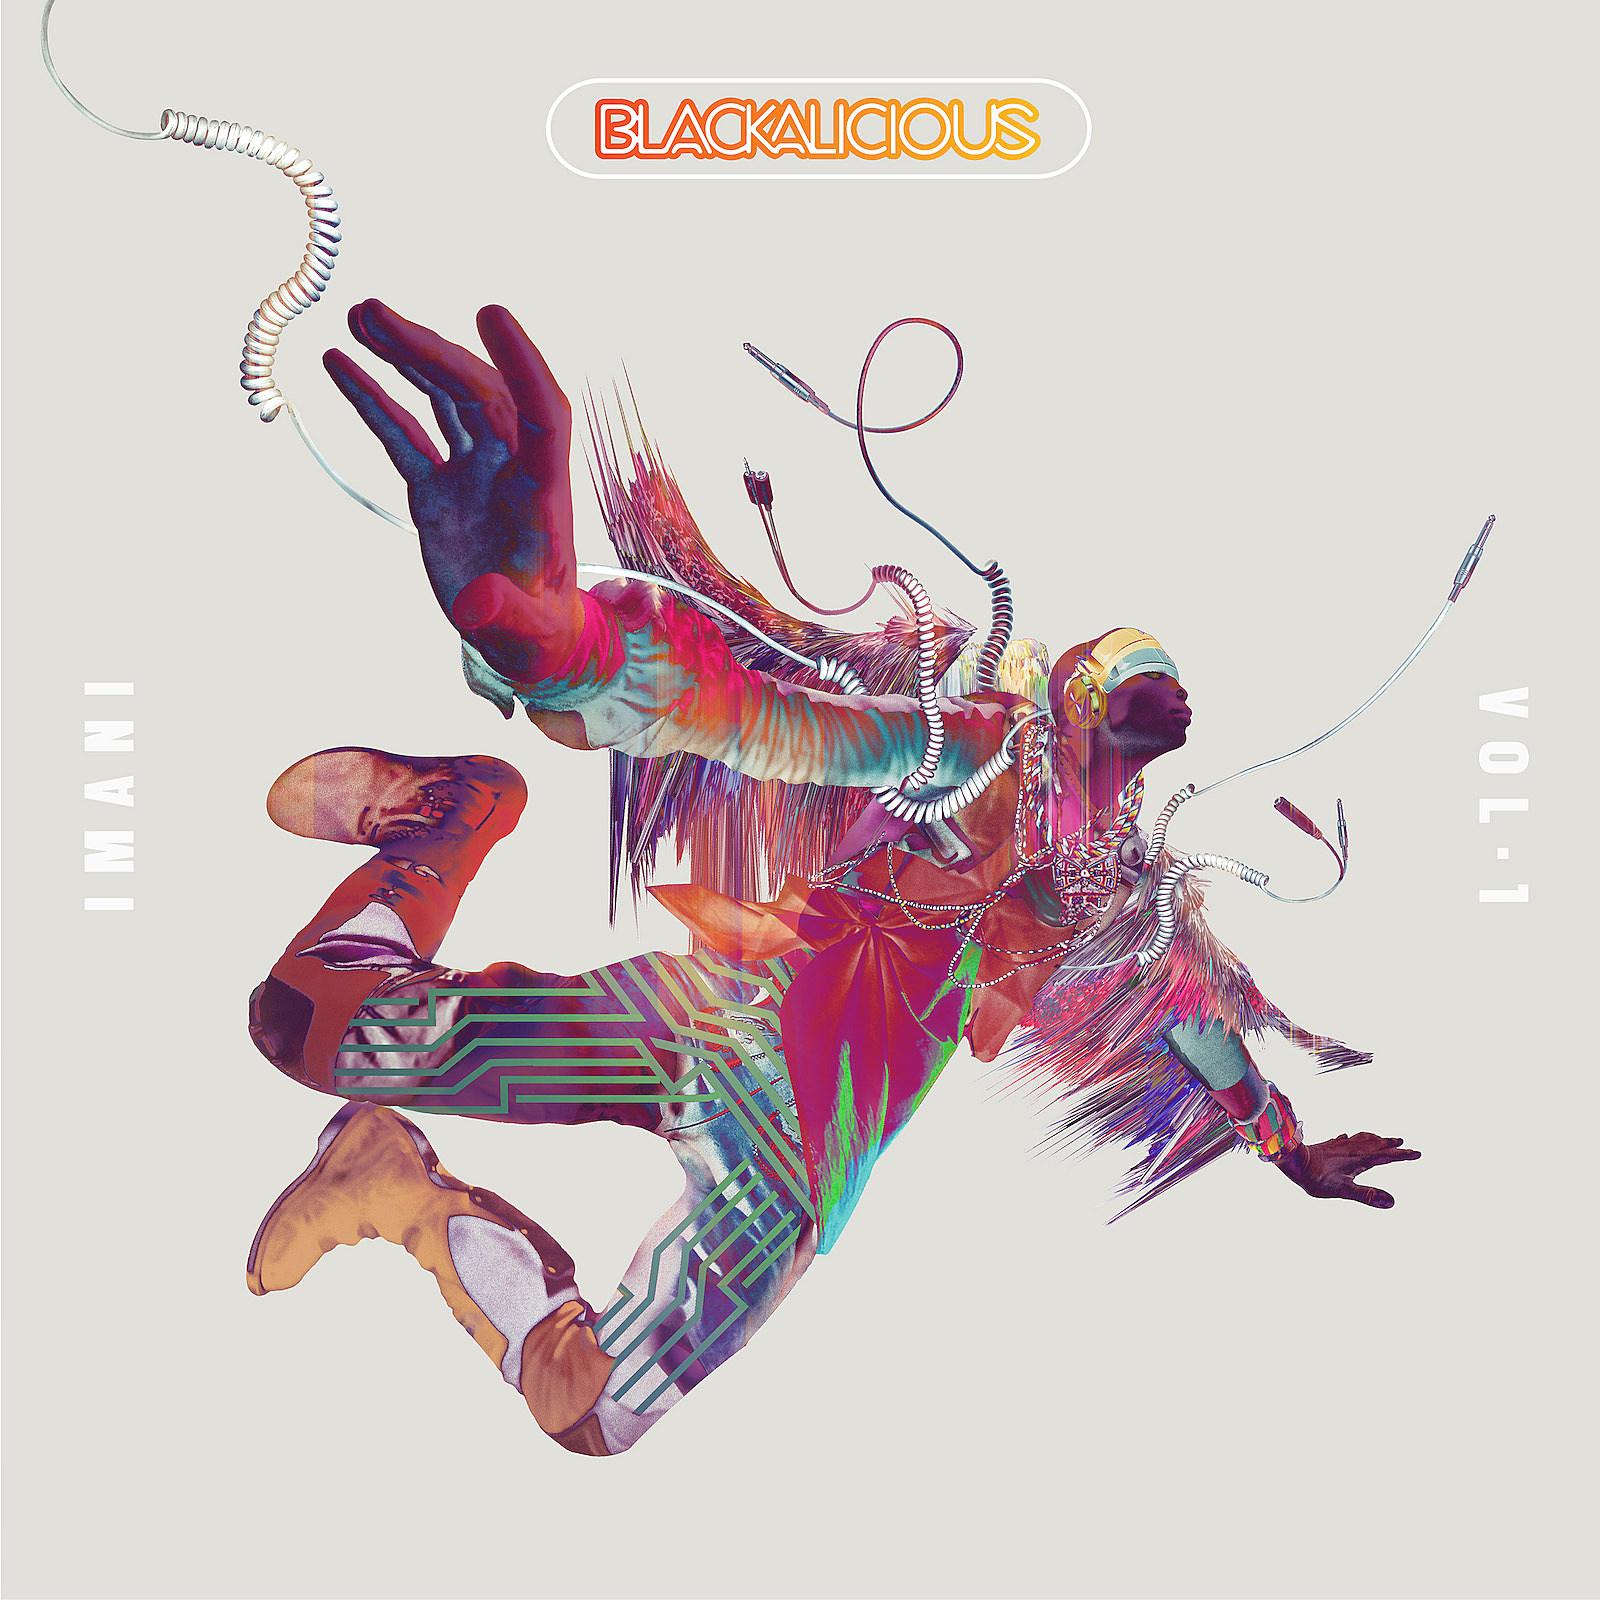 blackalicious gift of gab chief xcel imani vol. 1 album cover art